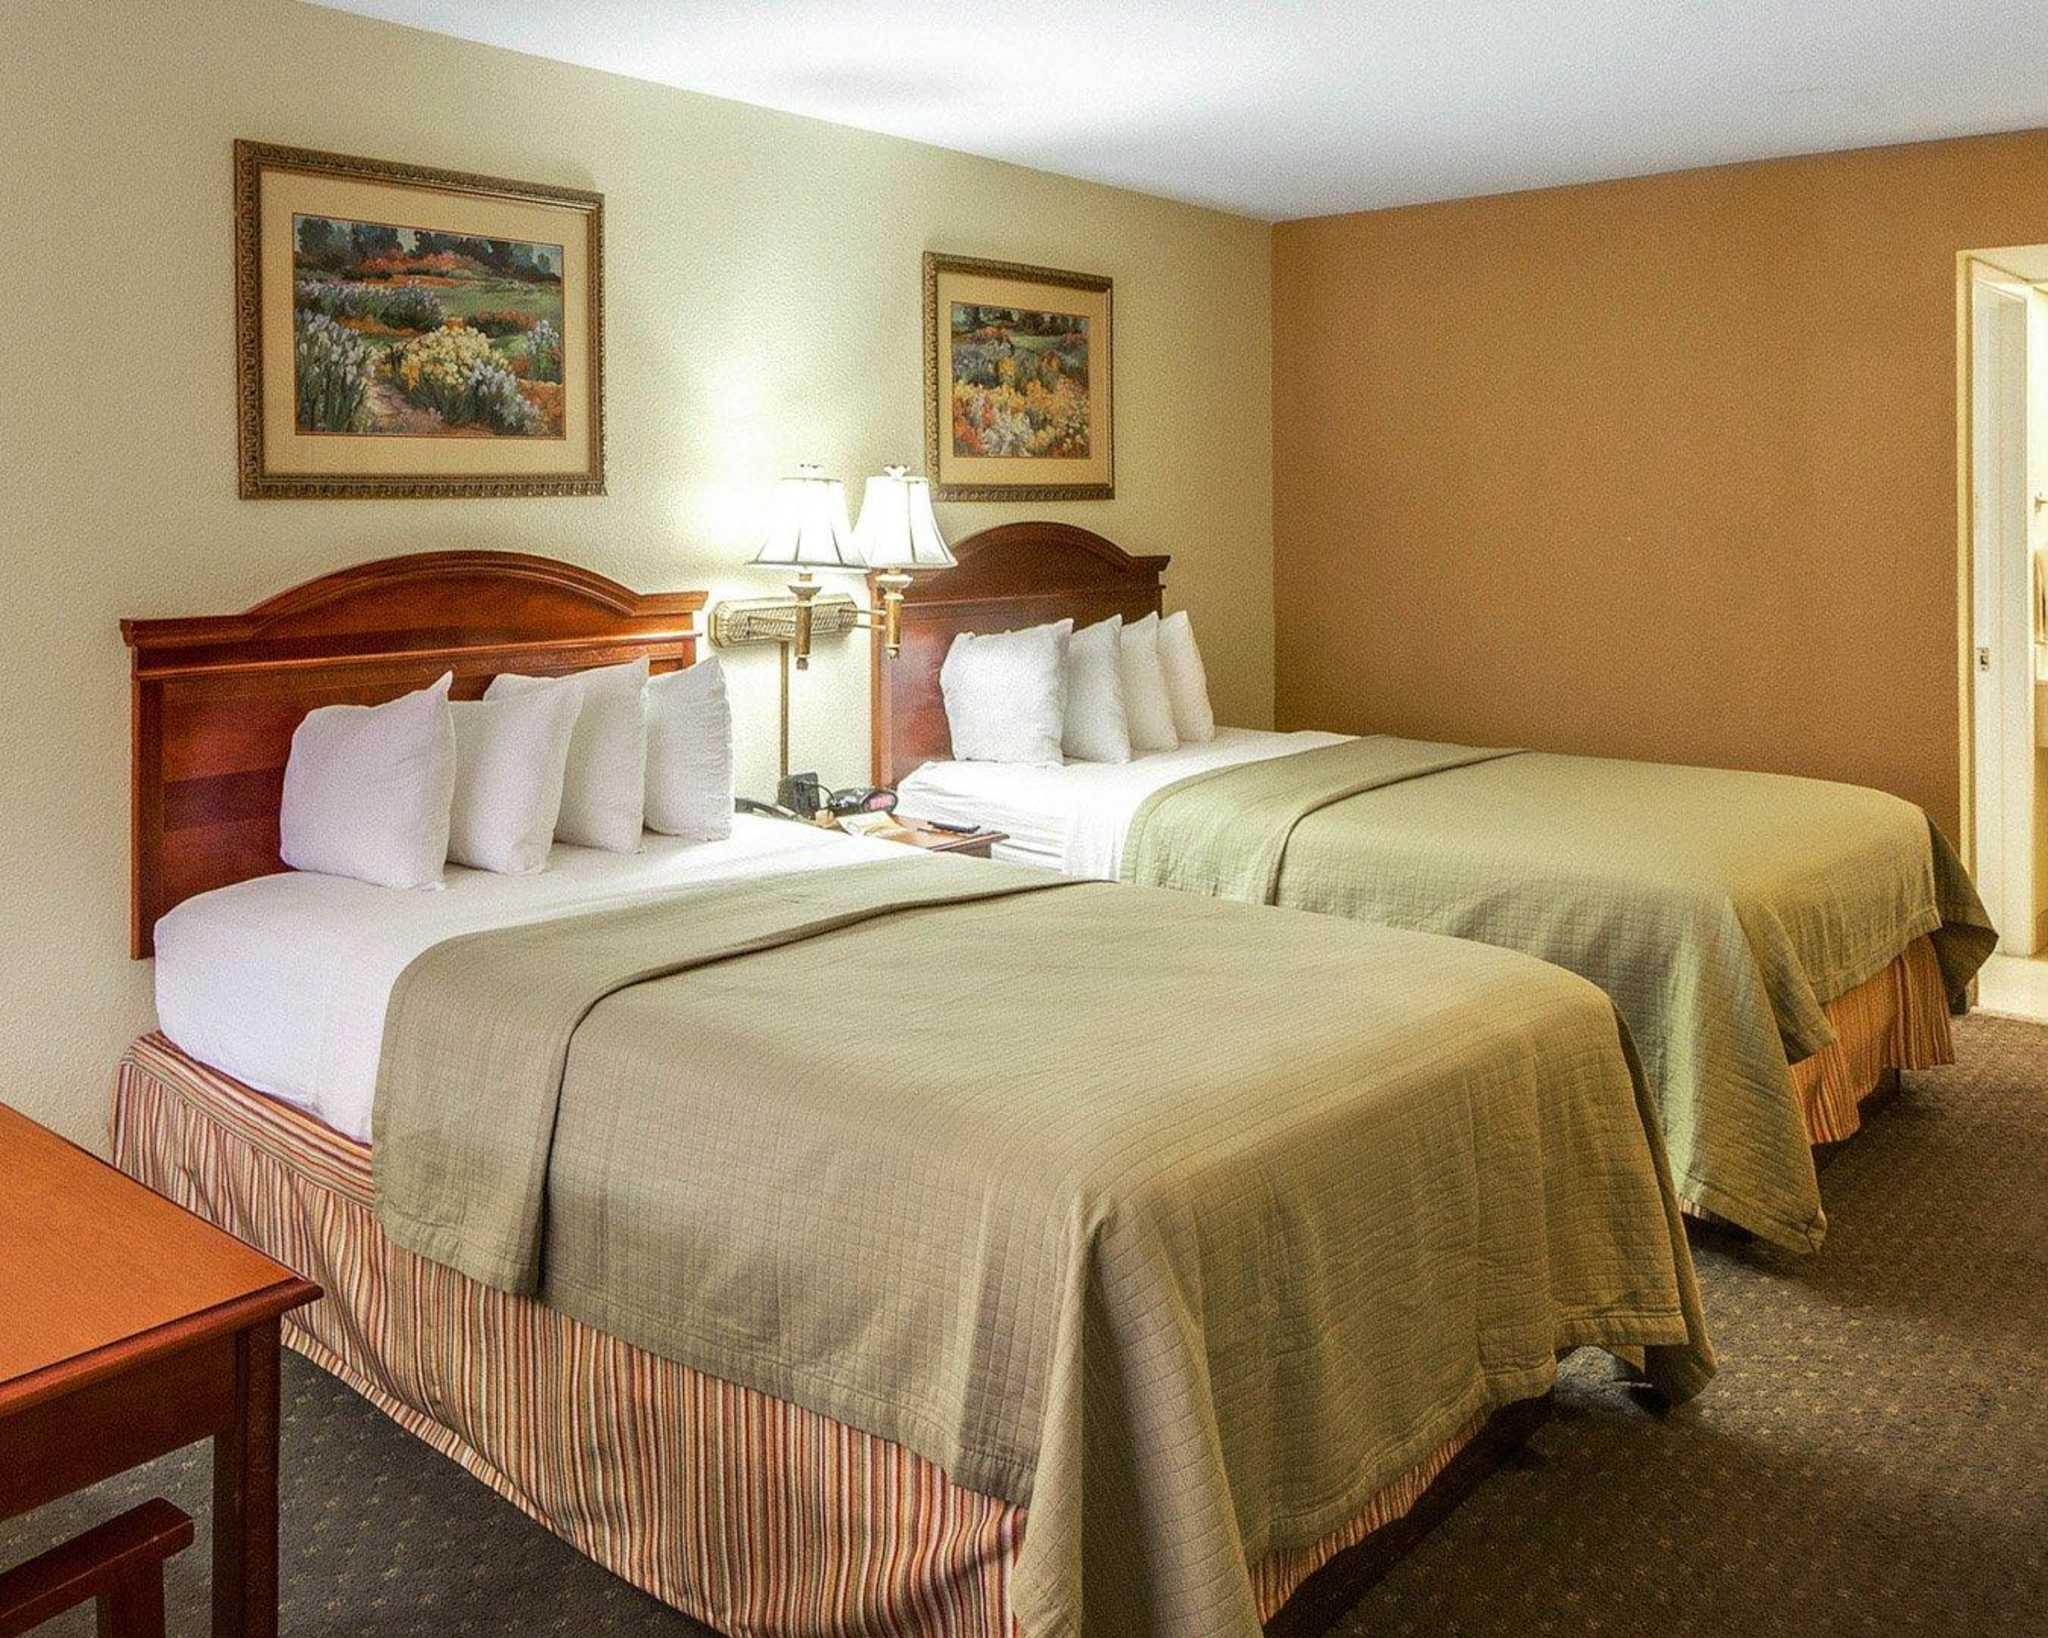 Quality Inn & Suites Eagle Pass image 3